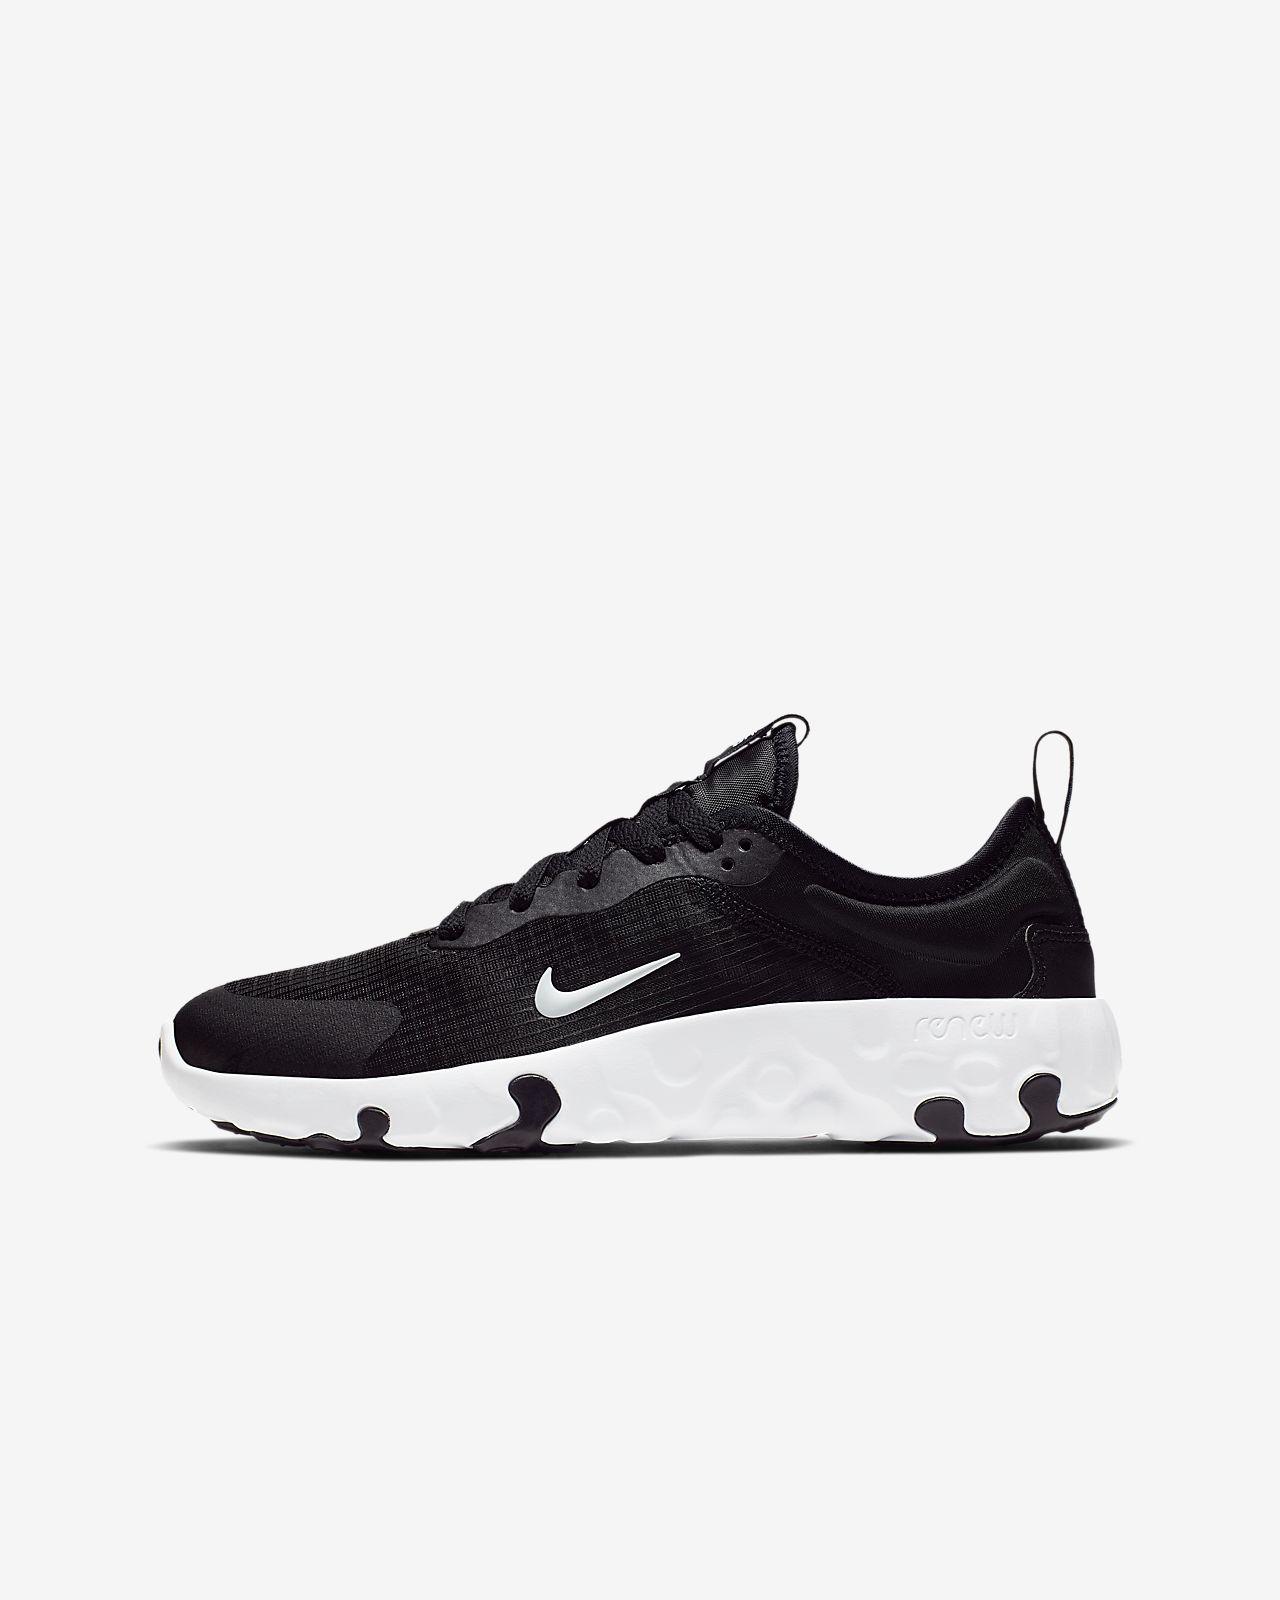 Sko Nike Renew Lucent för ungdom